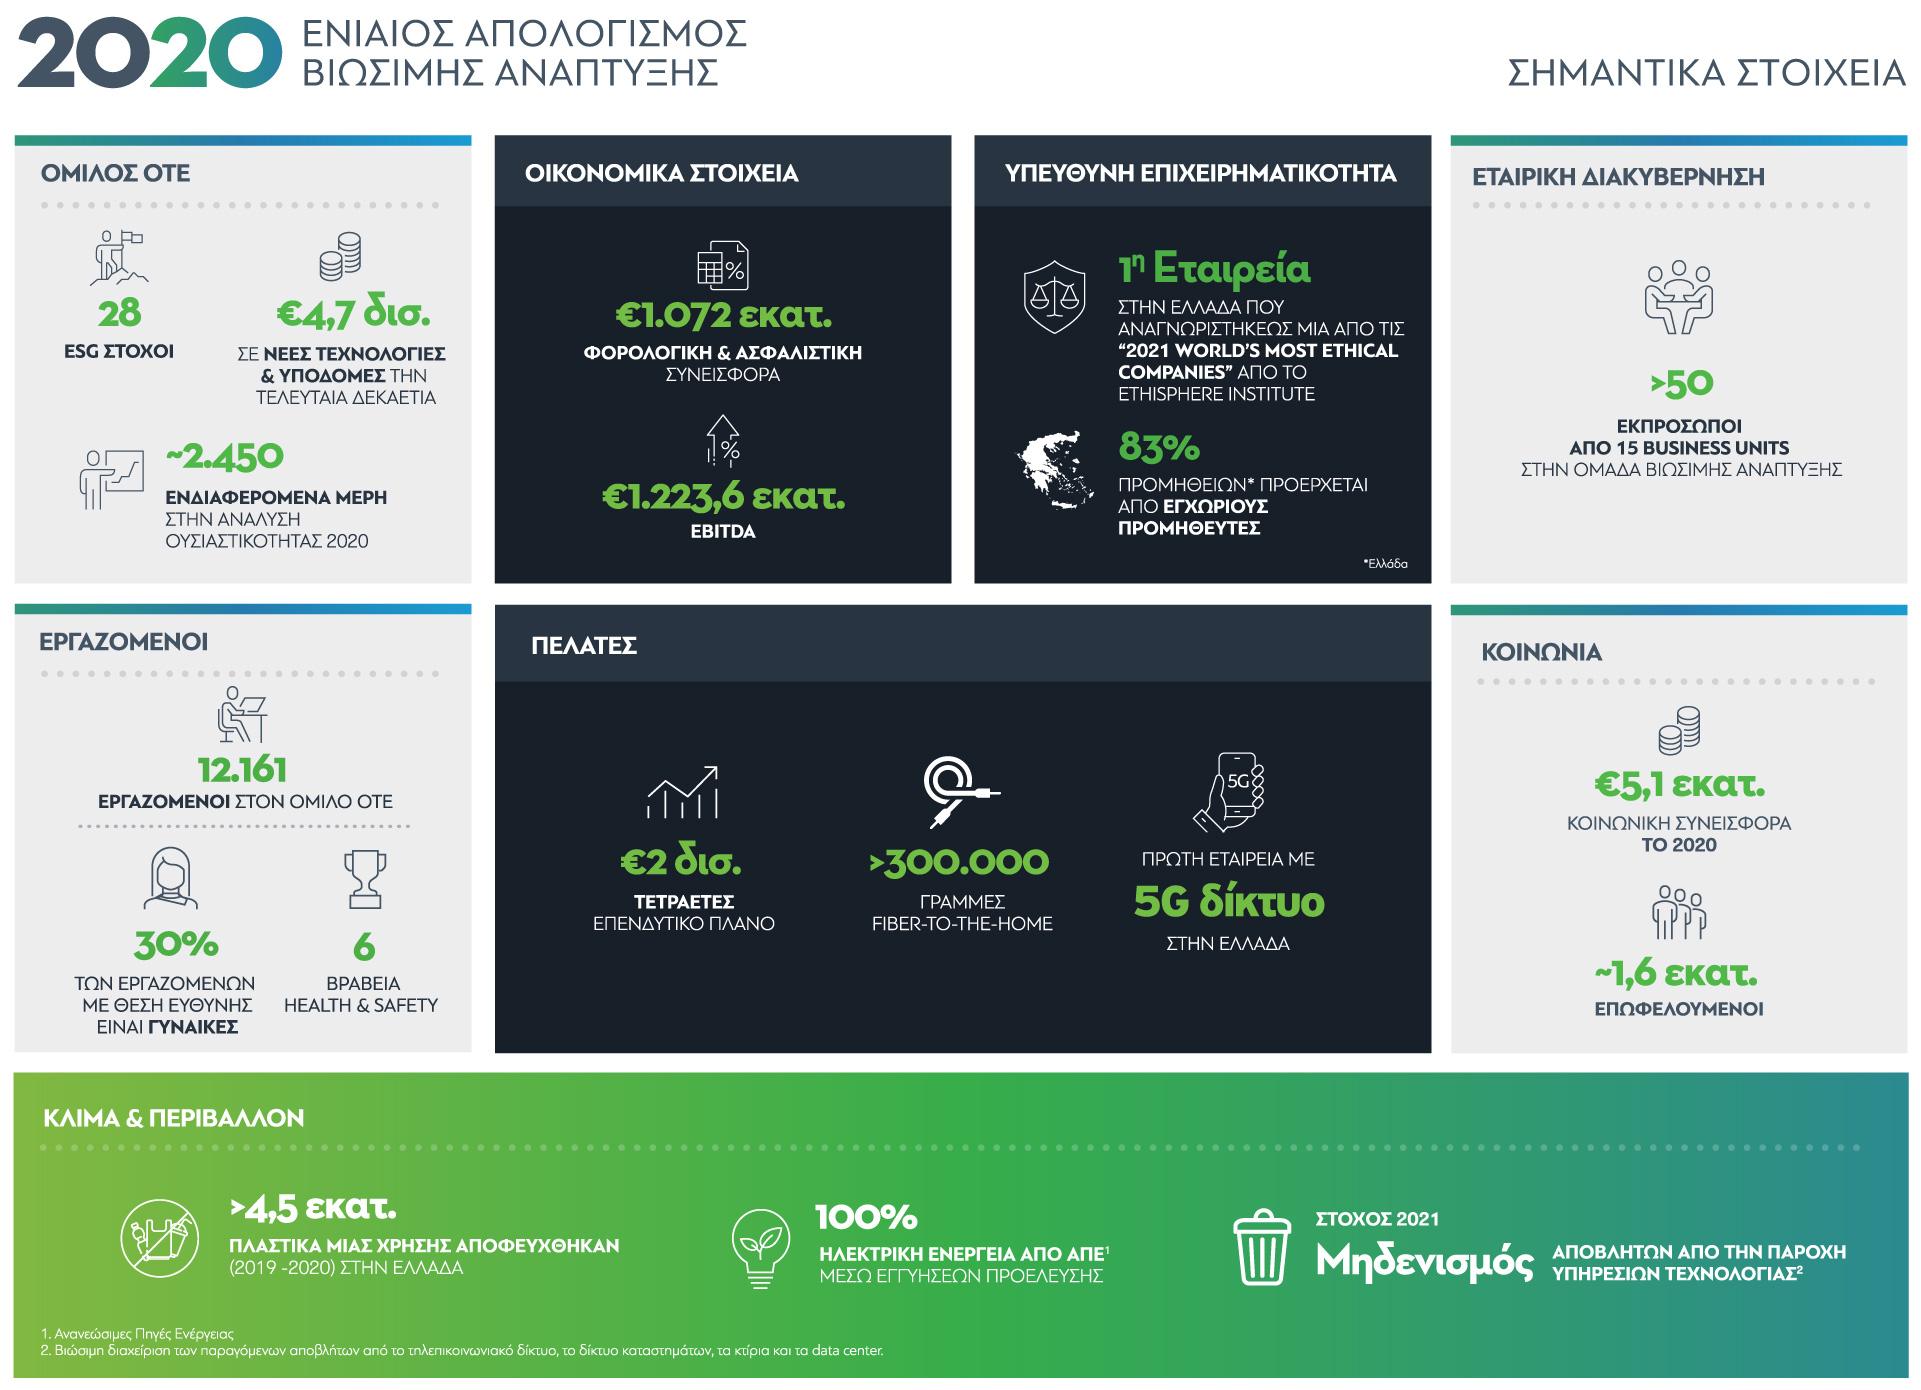 OTE Group 2020 IntegratedReport infographic gr